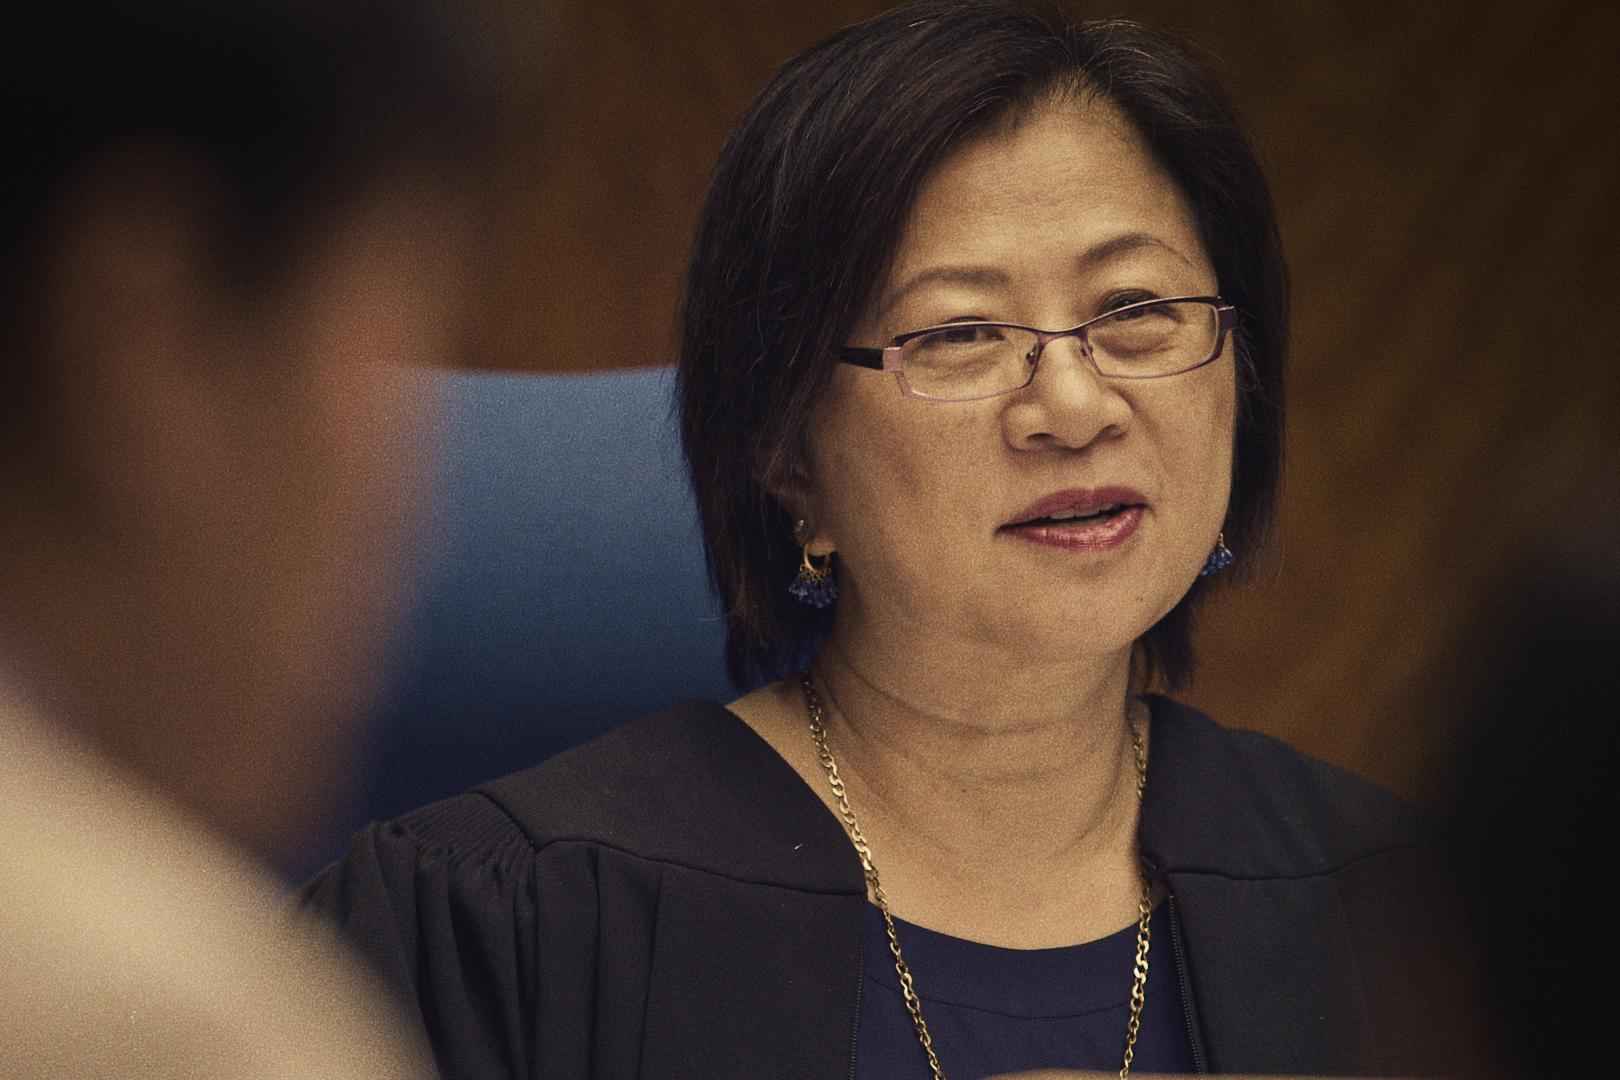 blowin up, sex workers, udge Toko Serita, Human Trafficking Intervention  Court